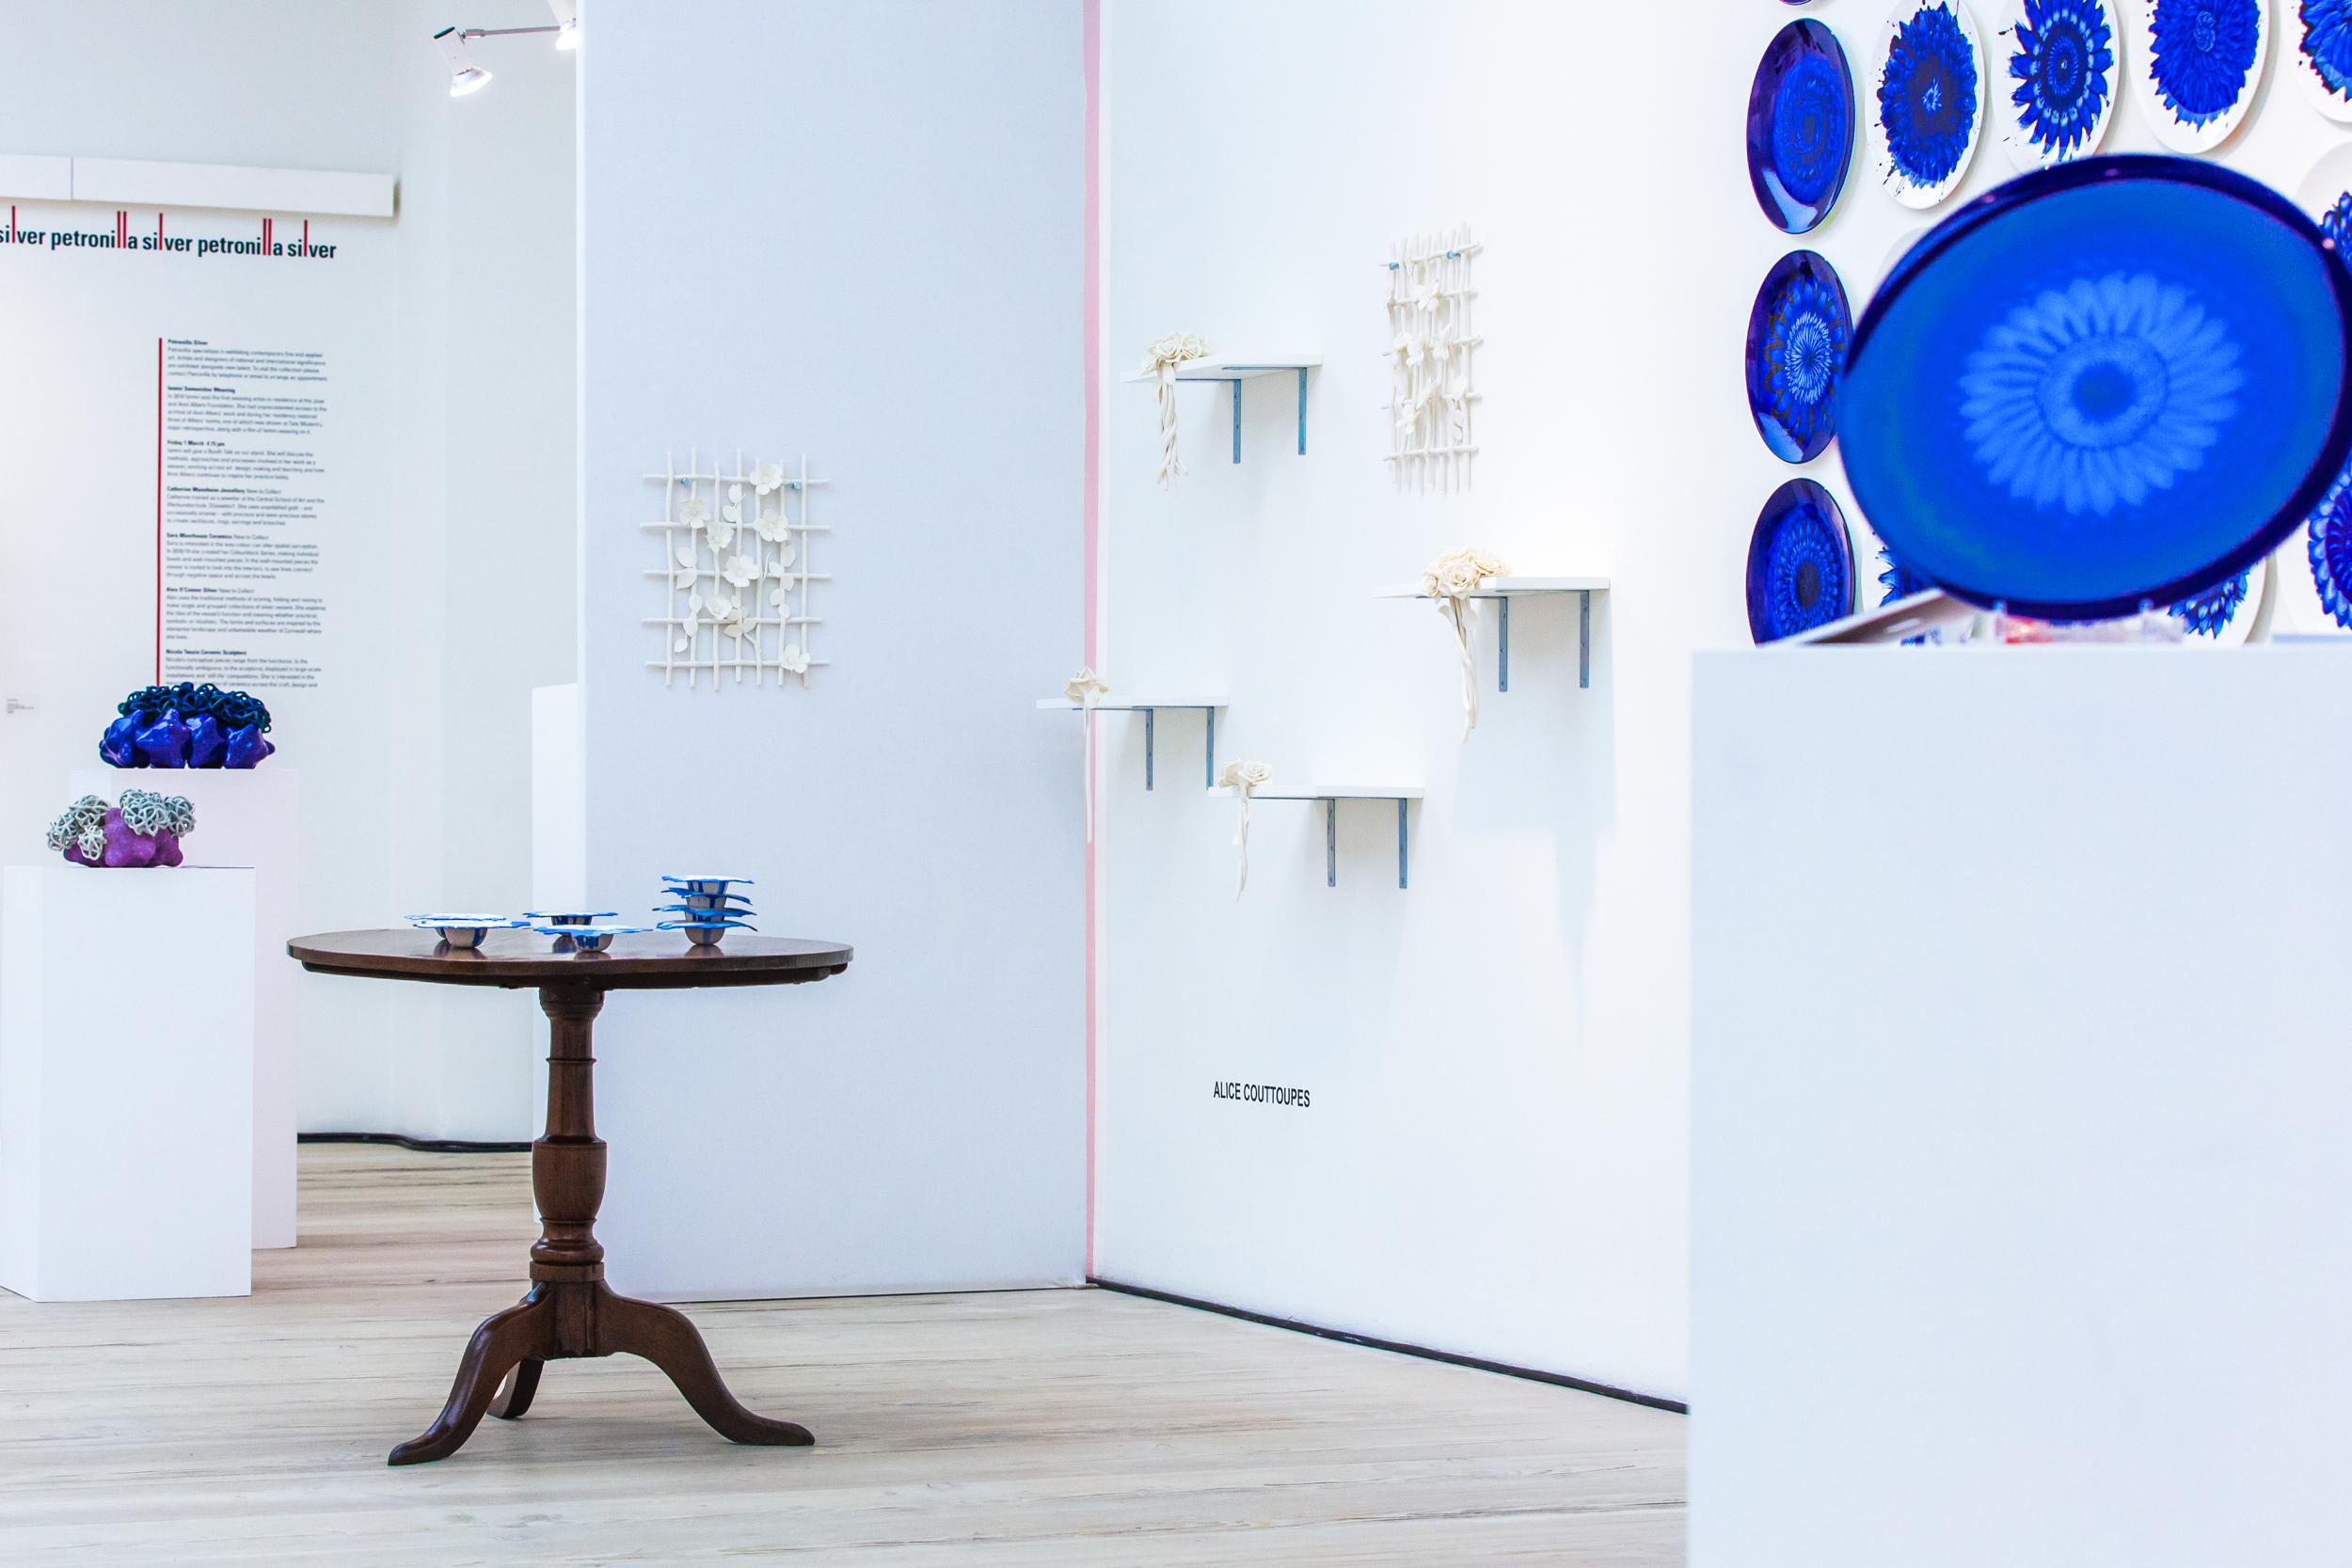 Alice Couttoupes at Collect 2019, Cynthia Corbett Gallery, Photo credit Cristina Schek (12).jpg